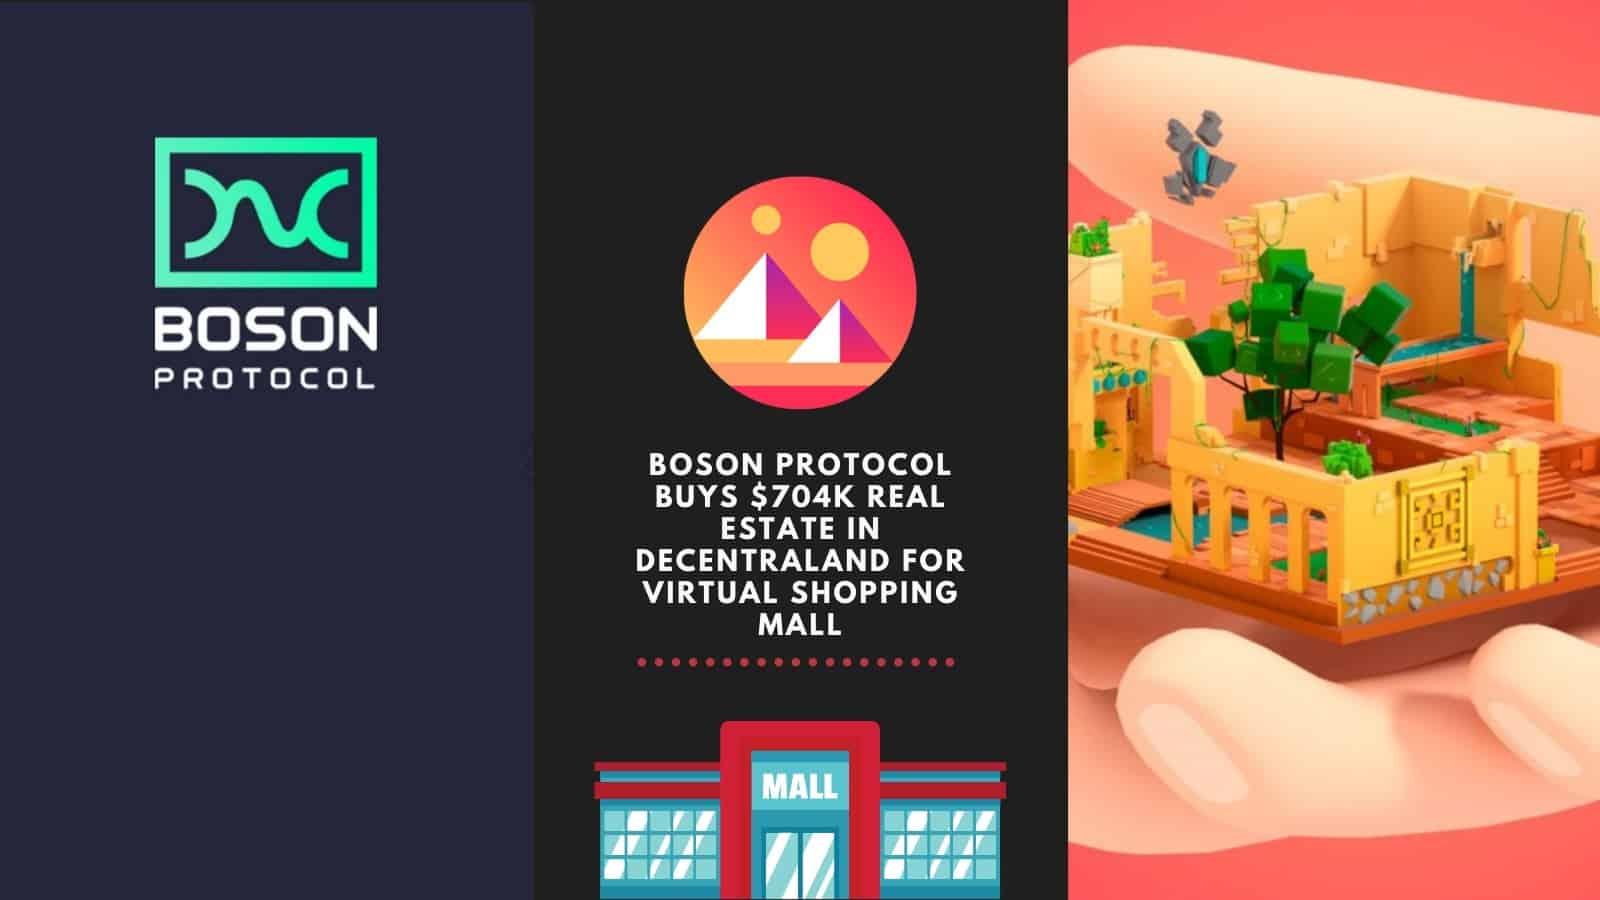 Boson Protocol Buys $704k Real Estate In Decentraland